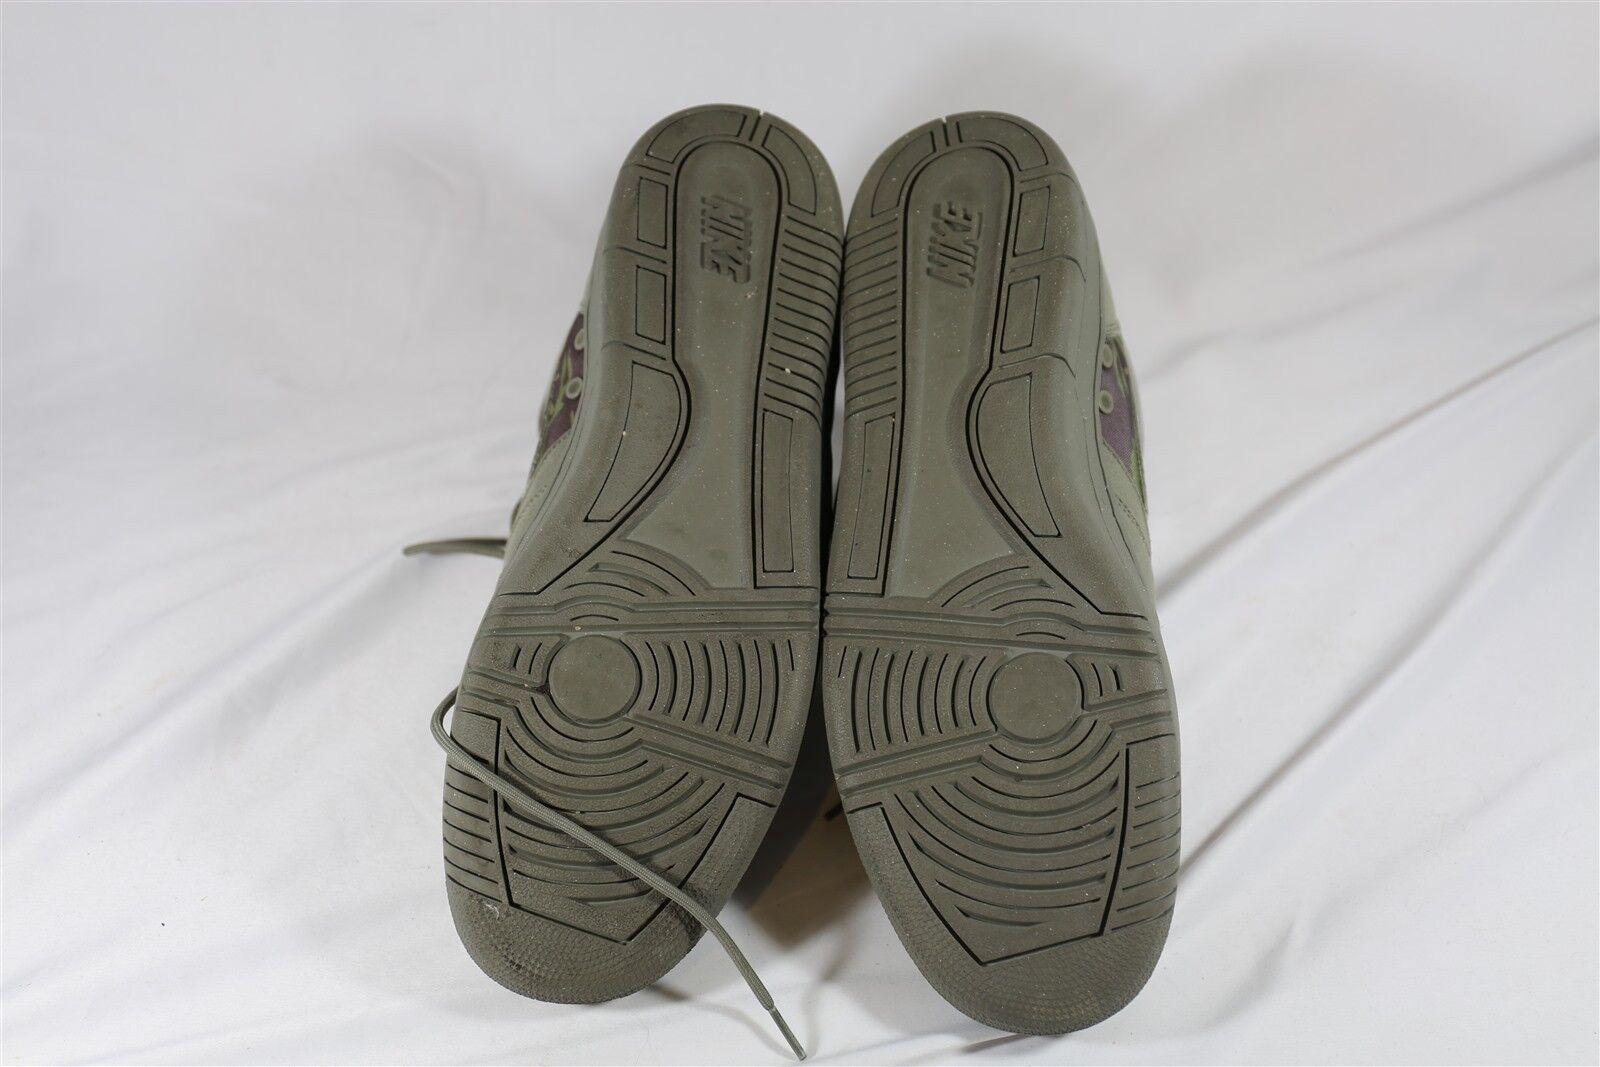 9209600d4d79 NIKE SKY FORCE 88 MID 454452-300 Size 15 15 15 Shoes e67164 ...